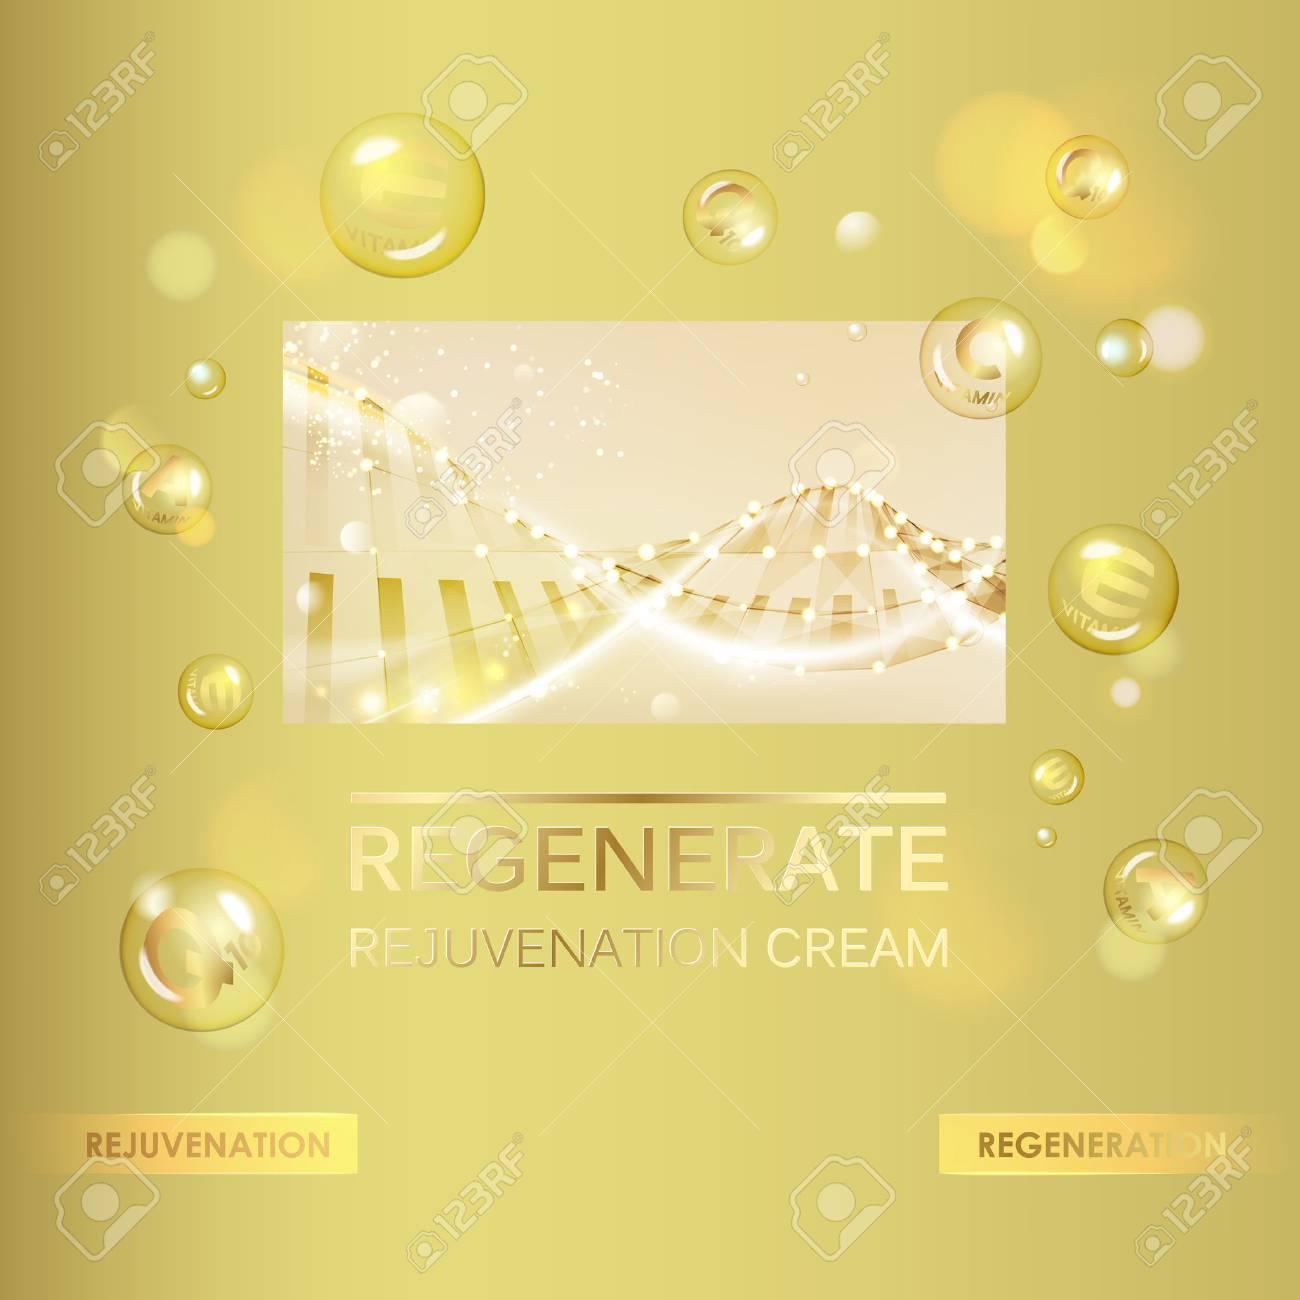 Collagen cream and Vitamin Drop of Concept Skin Care Cosmetic. Vitamin E drop with white sphere. Beauty treatment nutrition skin care design. Vector illustration. - 60174066